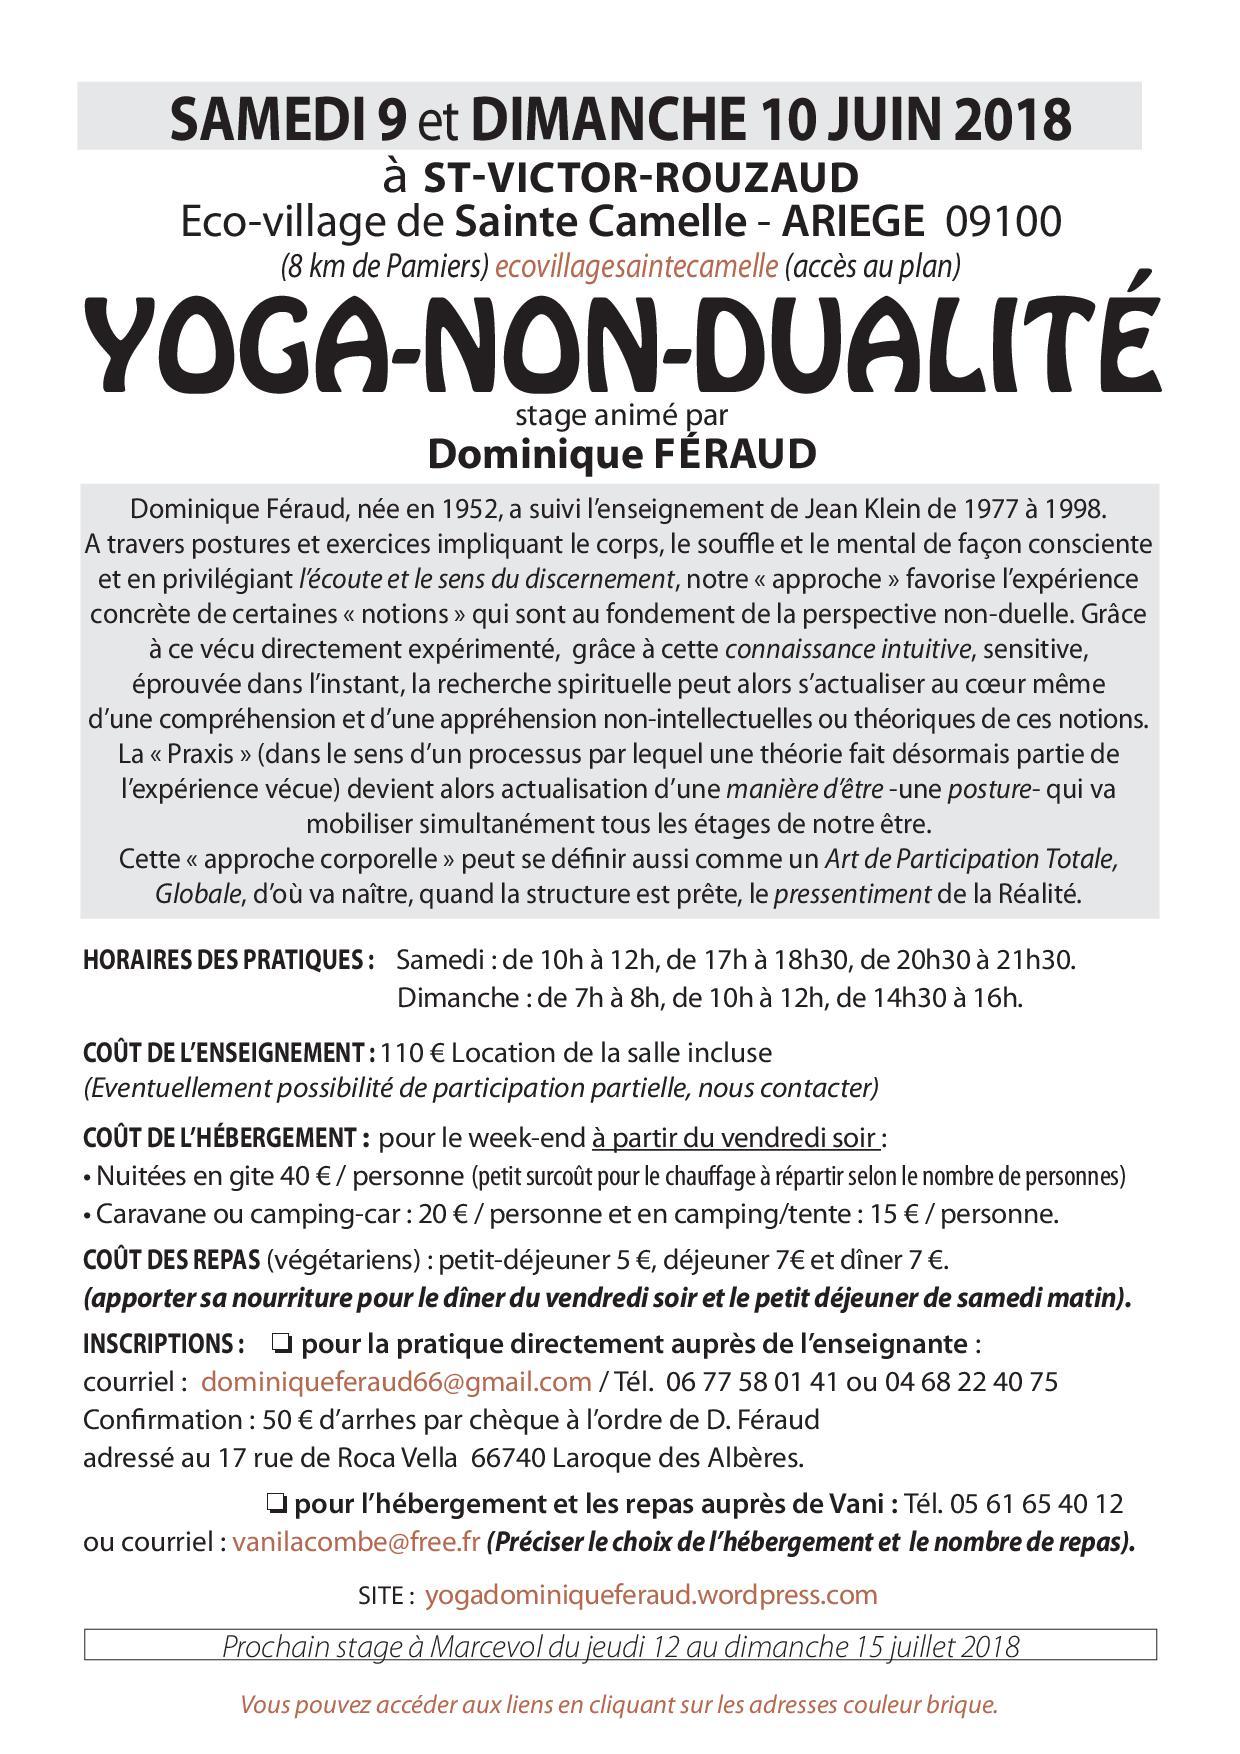 stcamelle-06-18